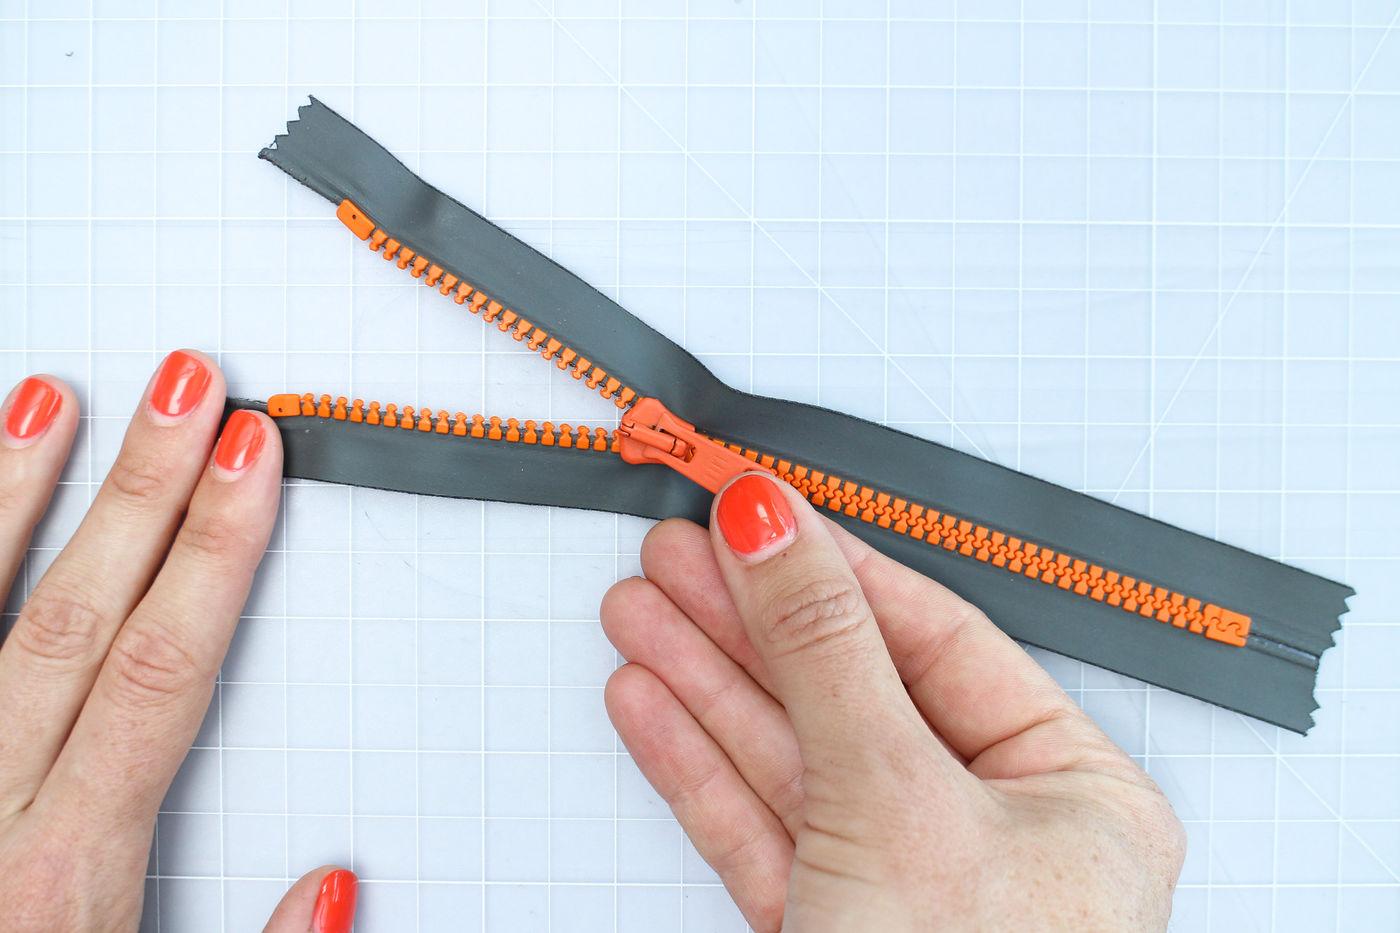 Anatomy of a Zipper